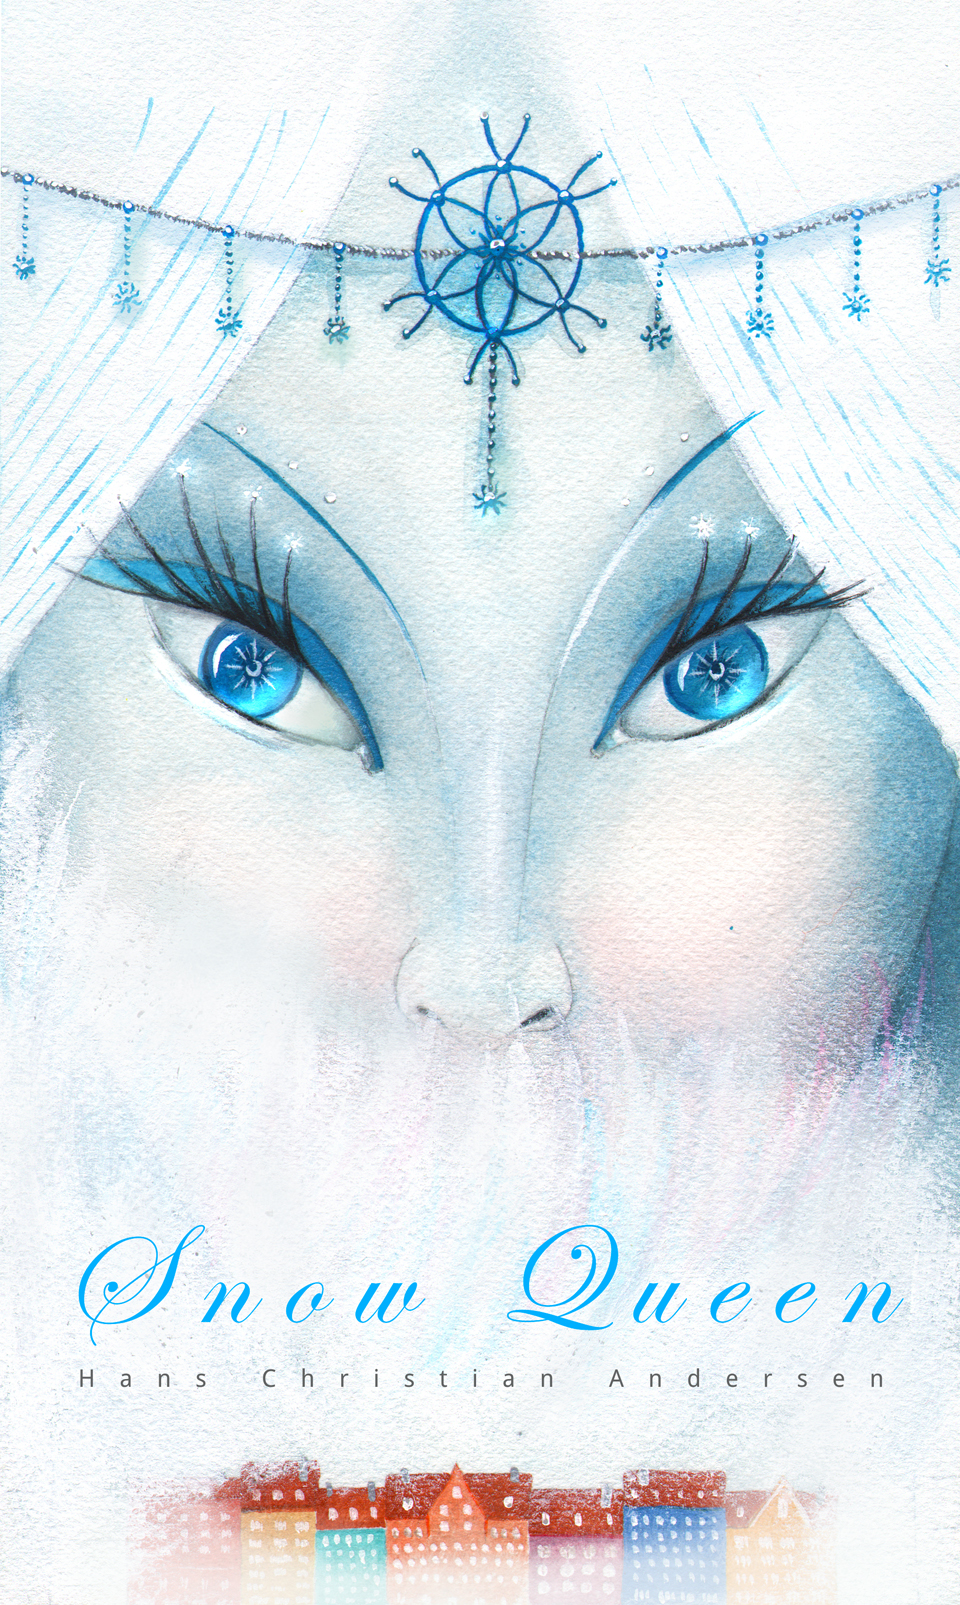 Snow Queen Illustrations Snow Queen Book Illustration